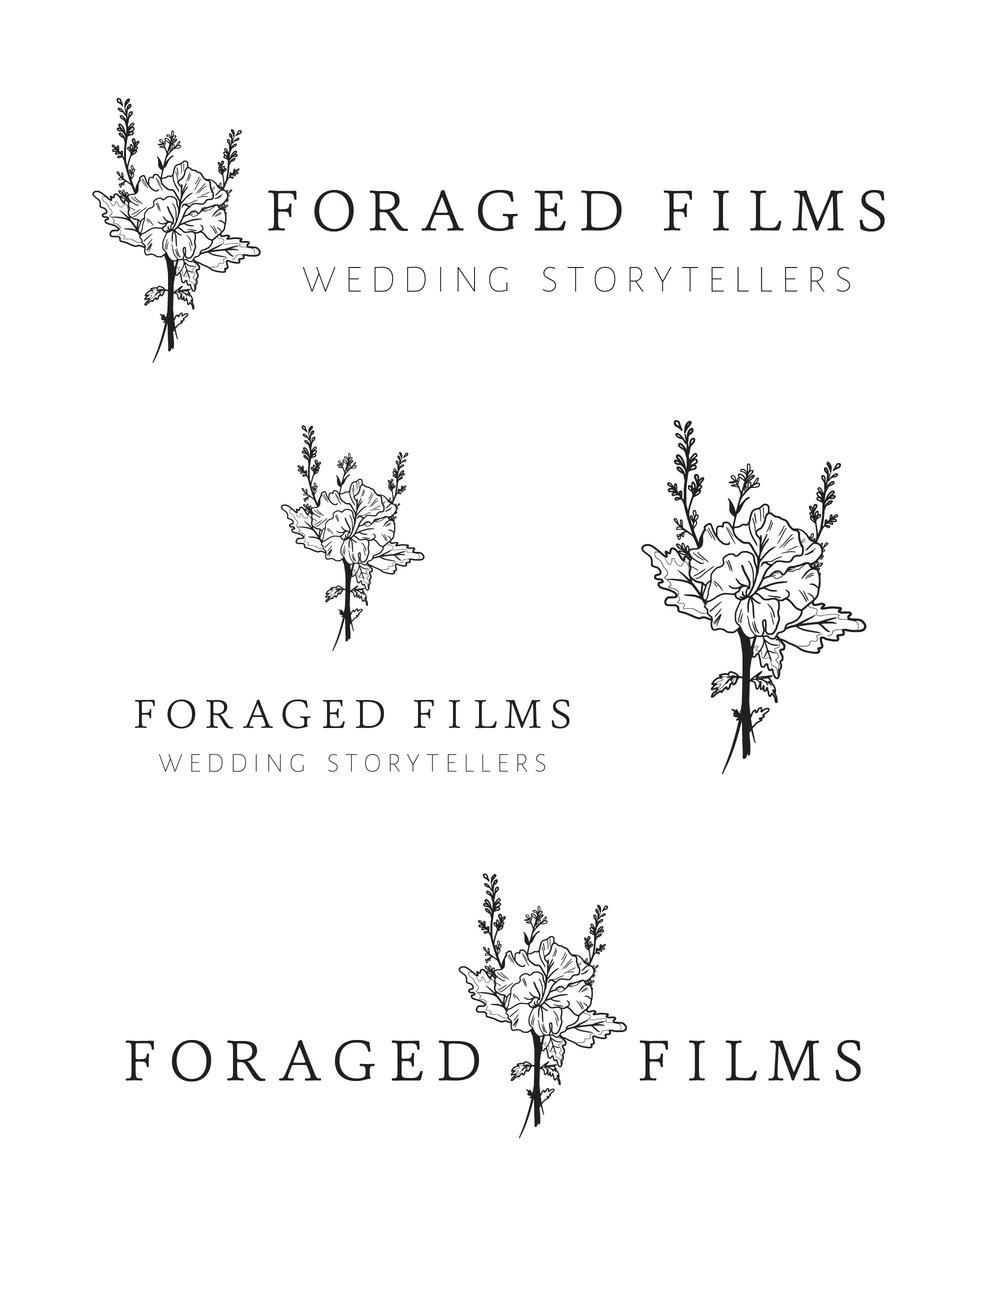 foragedfilms_logos_black.jpg